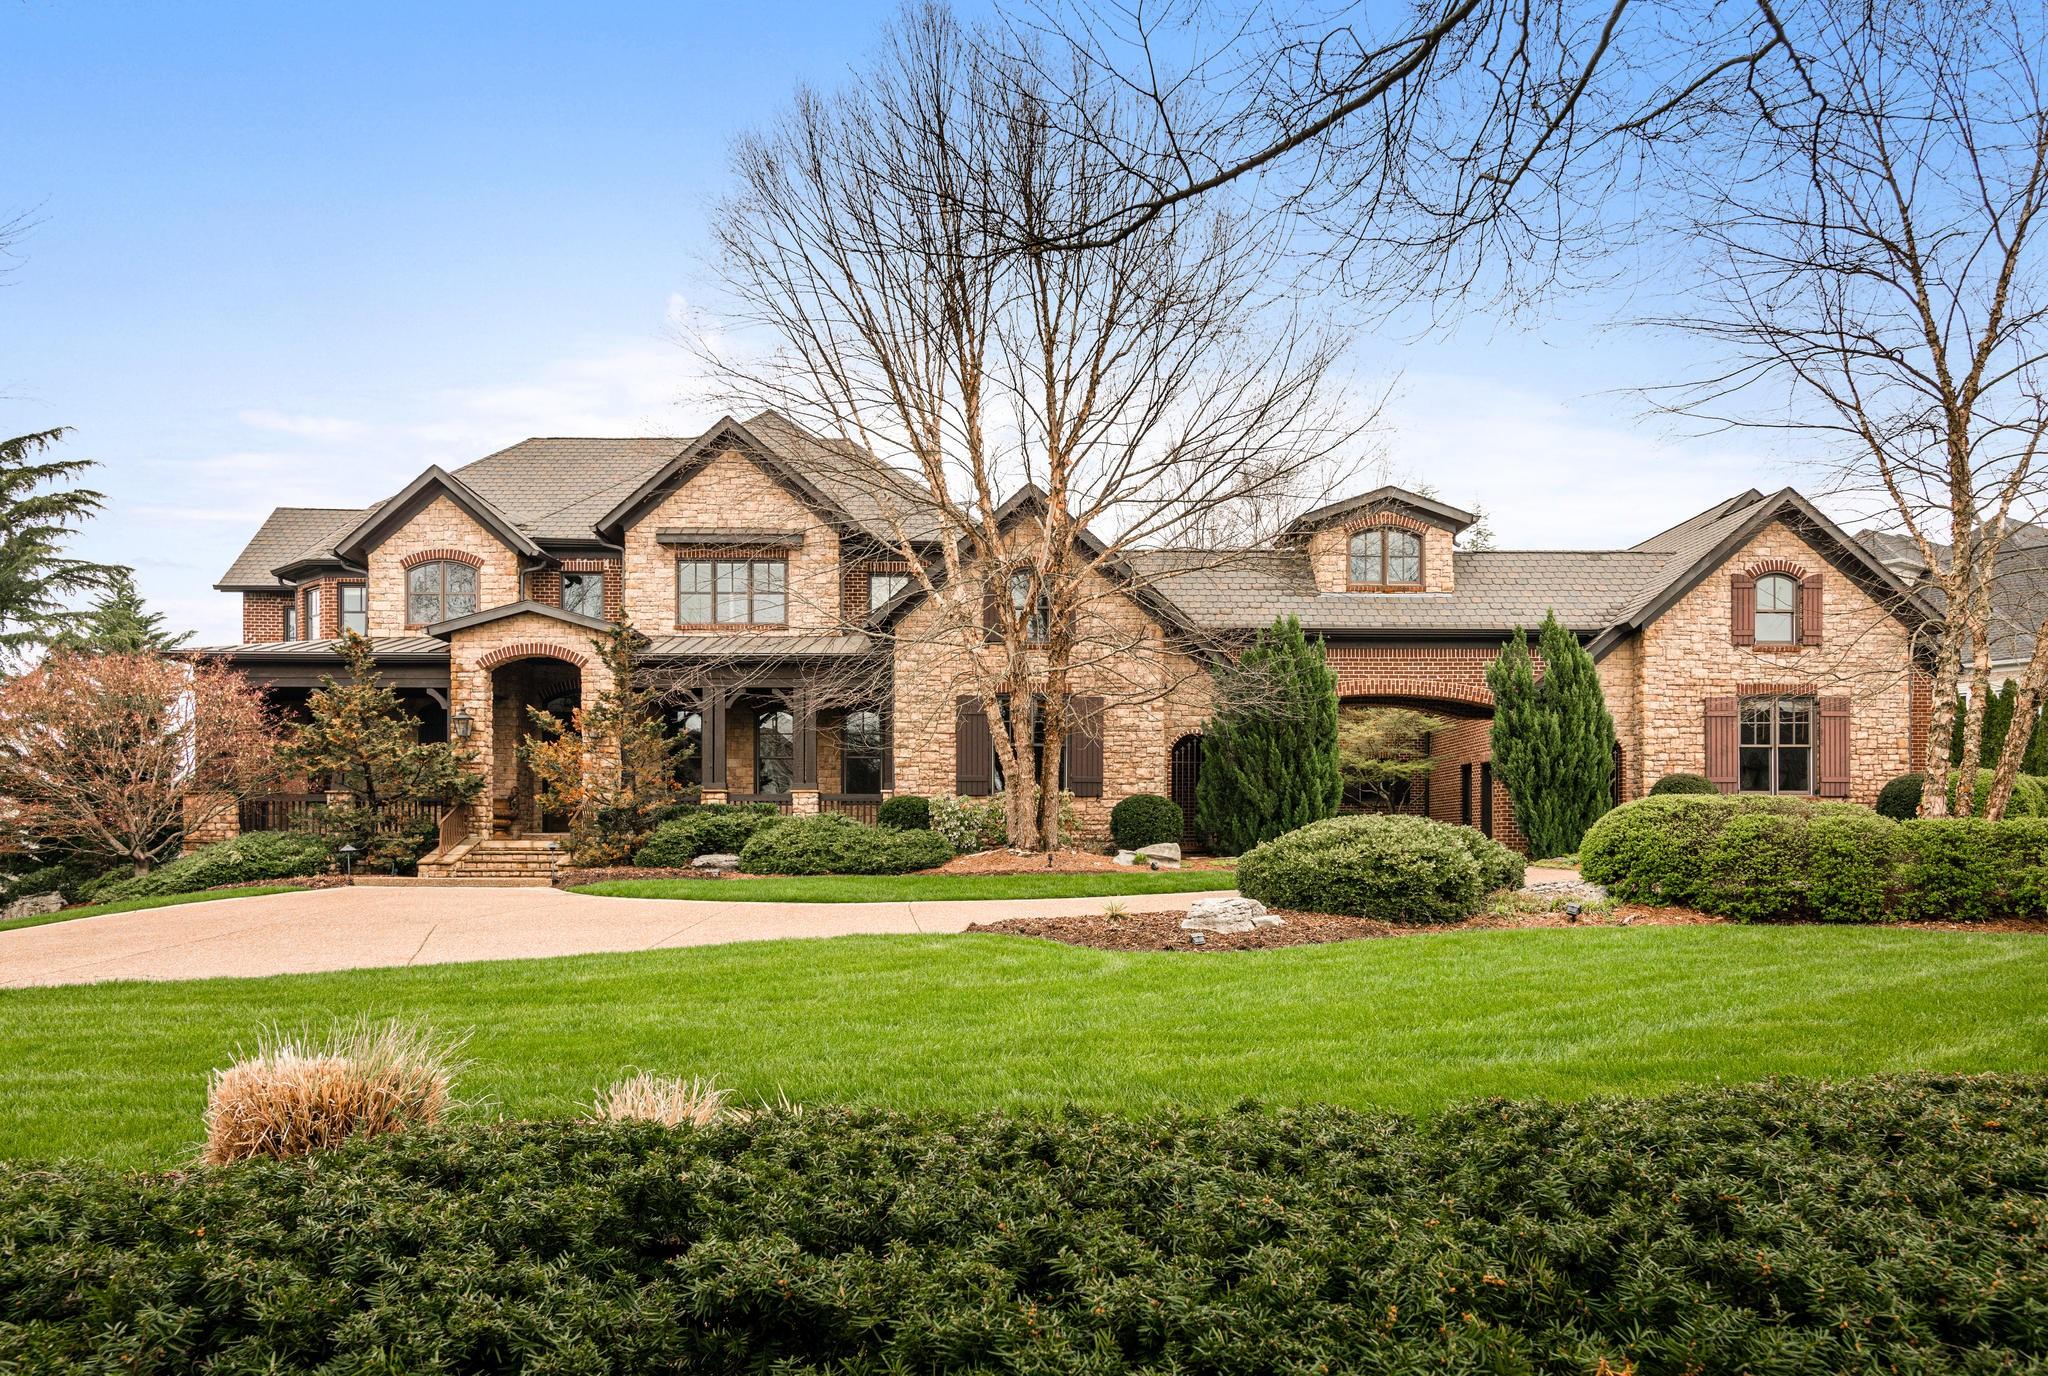 298 Jones Pkwy, Brentwood, TN 37027 - Brentwood, TN real estate listing